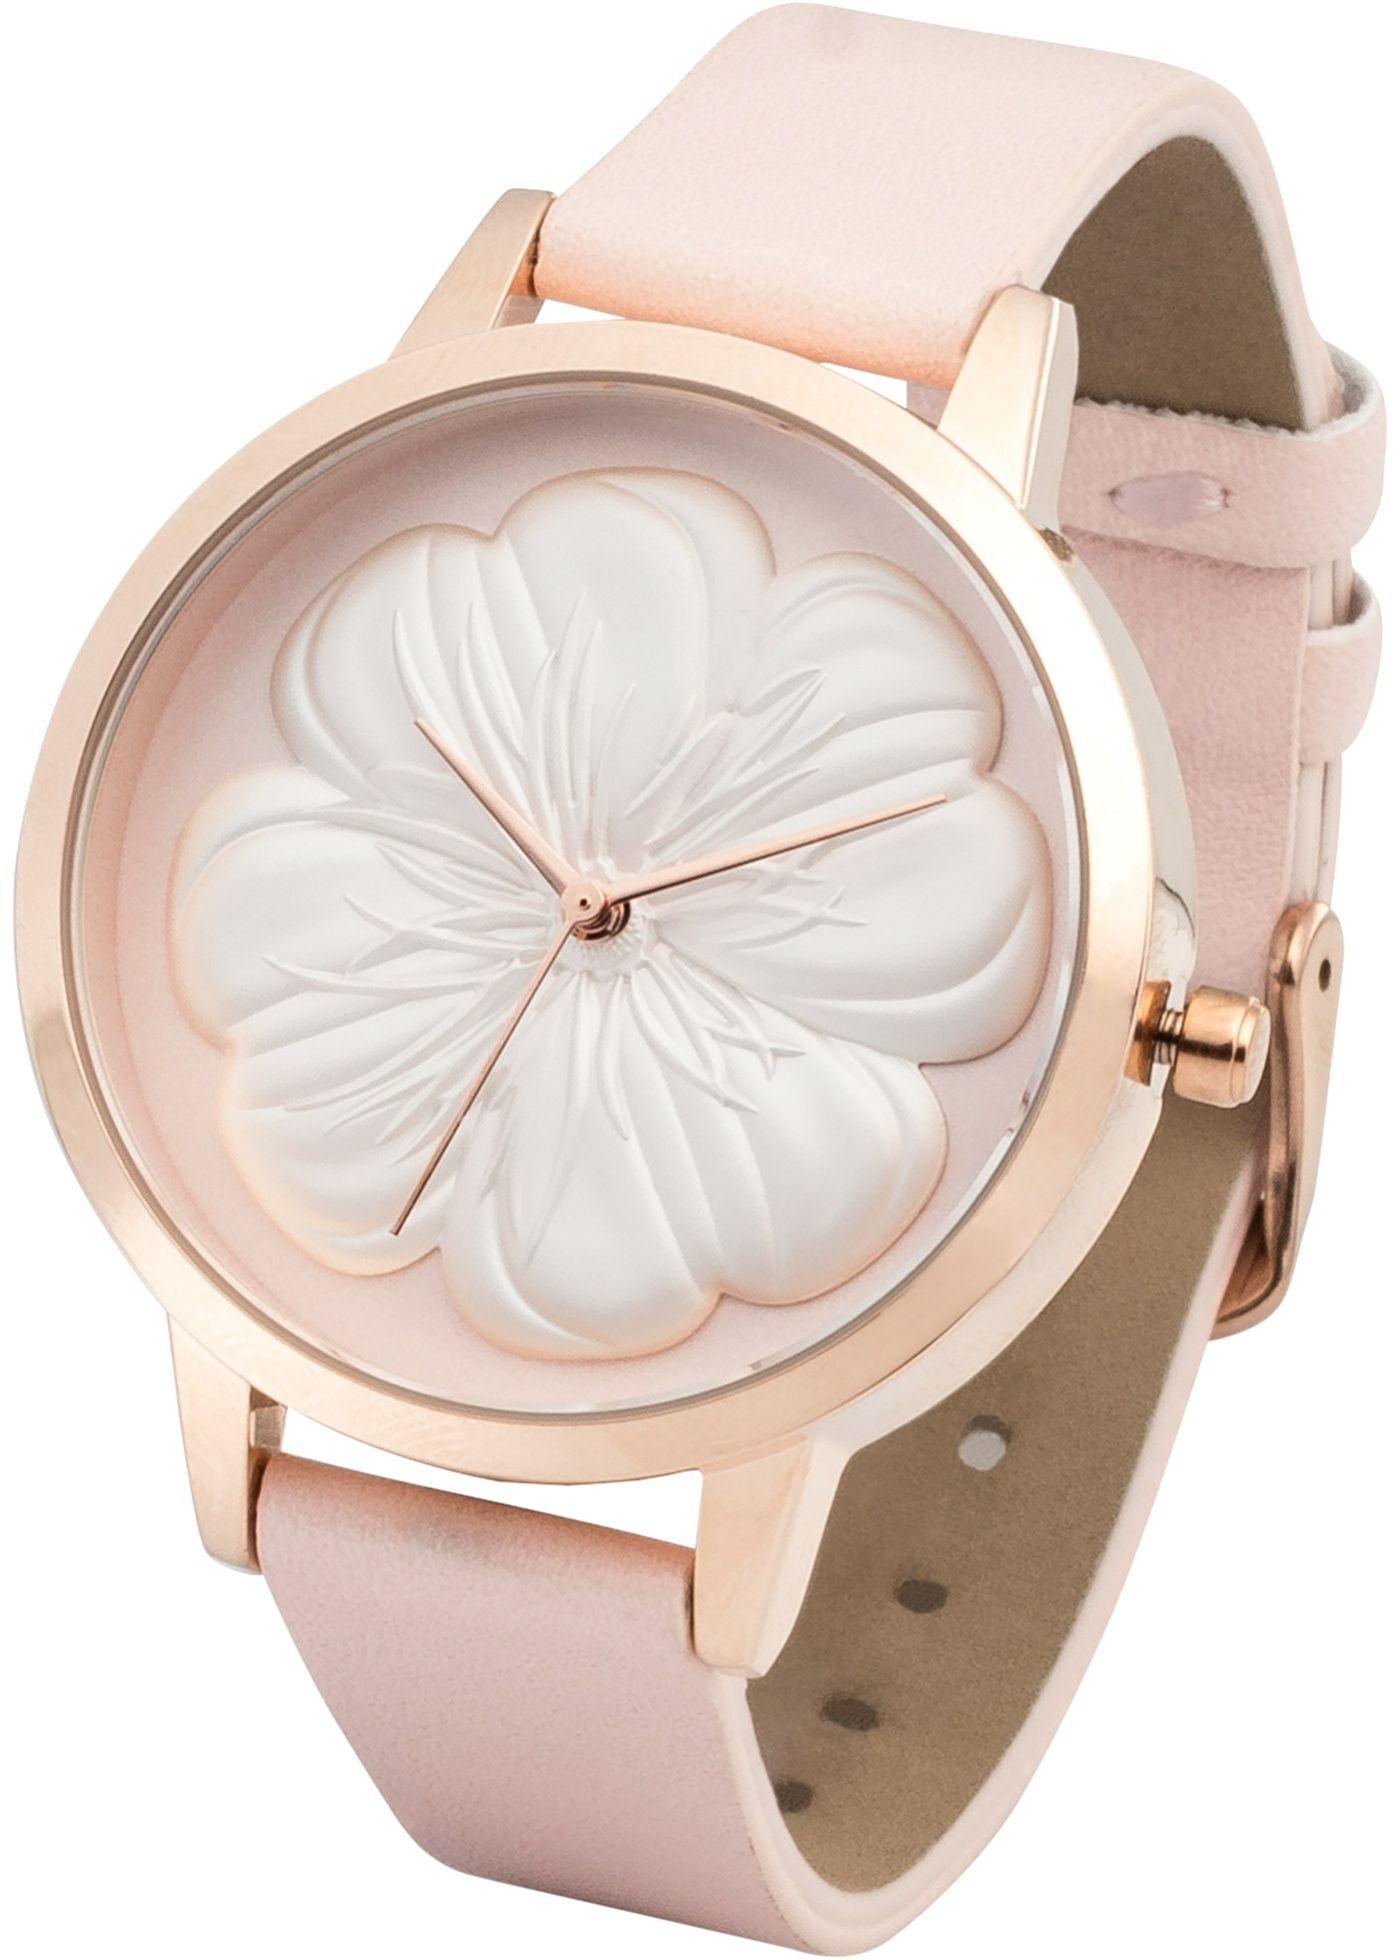 Armbanduhr - designt von Maite Kelly  Armbanduhr, Maite kelly